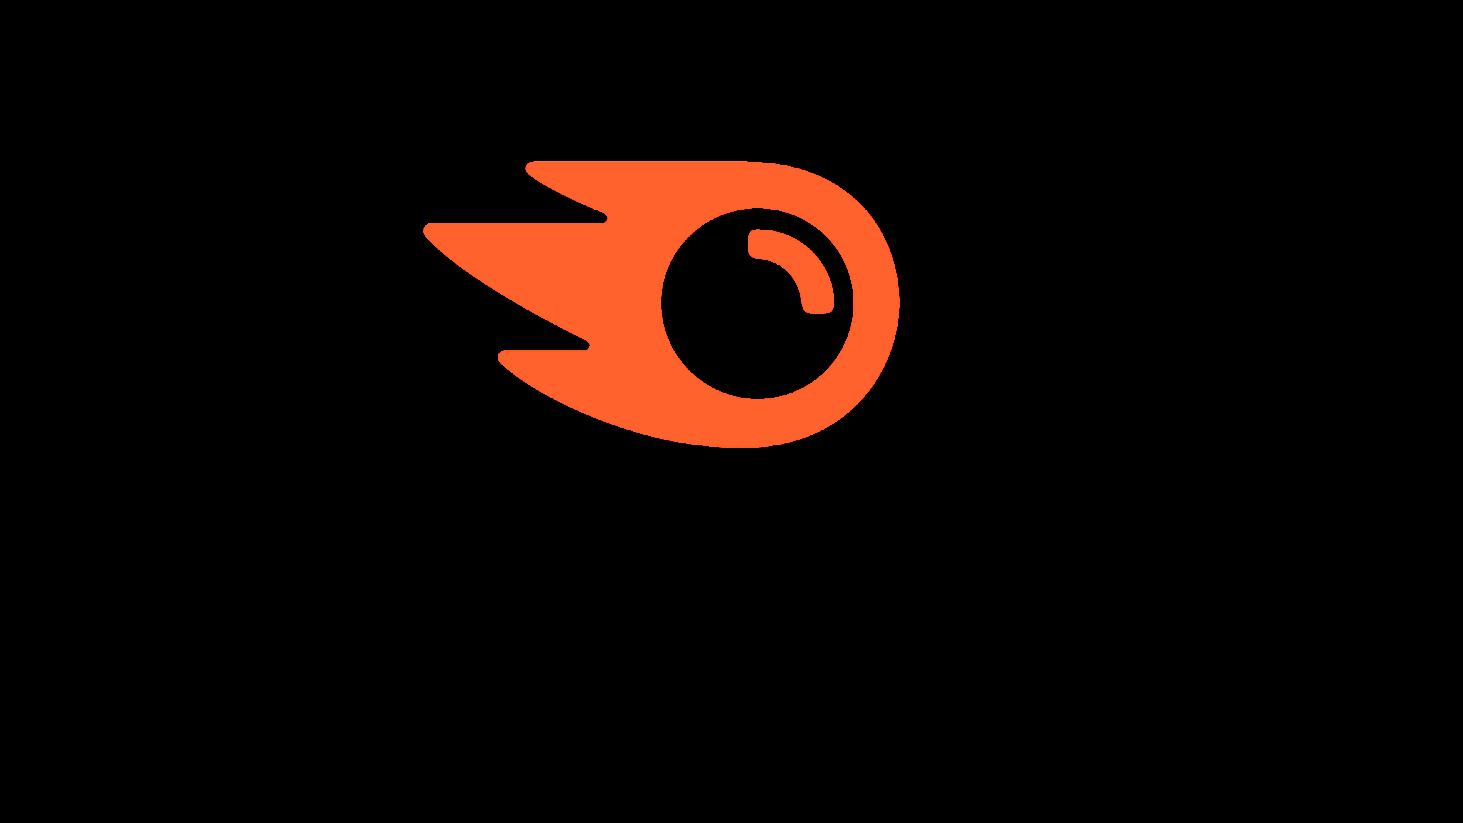 SEMRush's logo